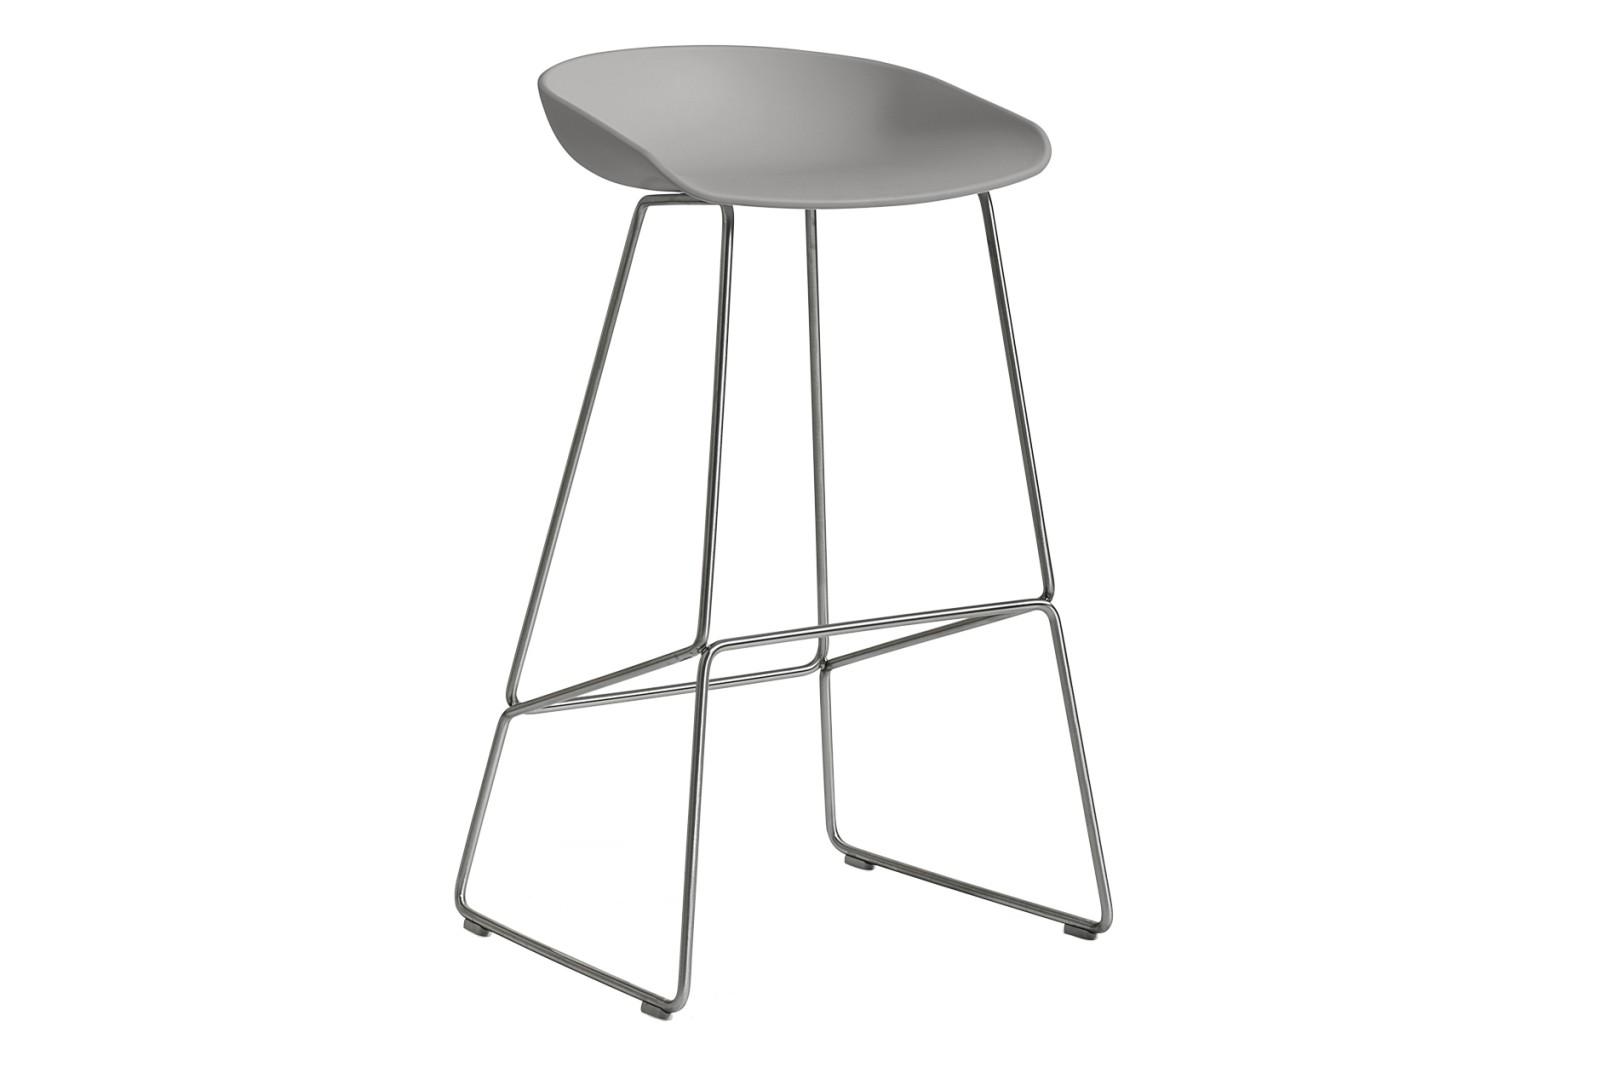 AAS 38 High Stool Metal Stainless Steel, Plastic Concrete Grey